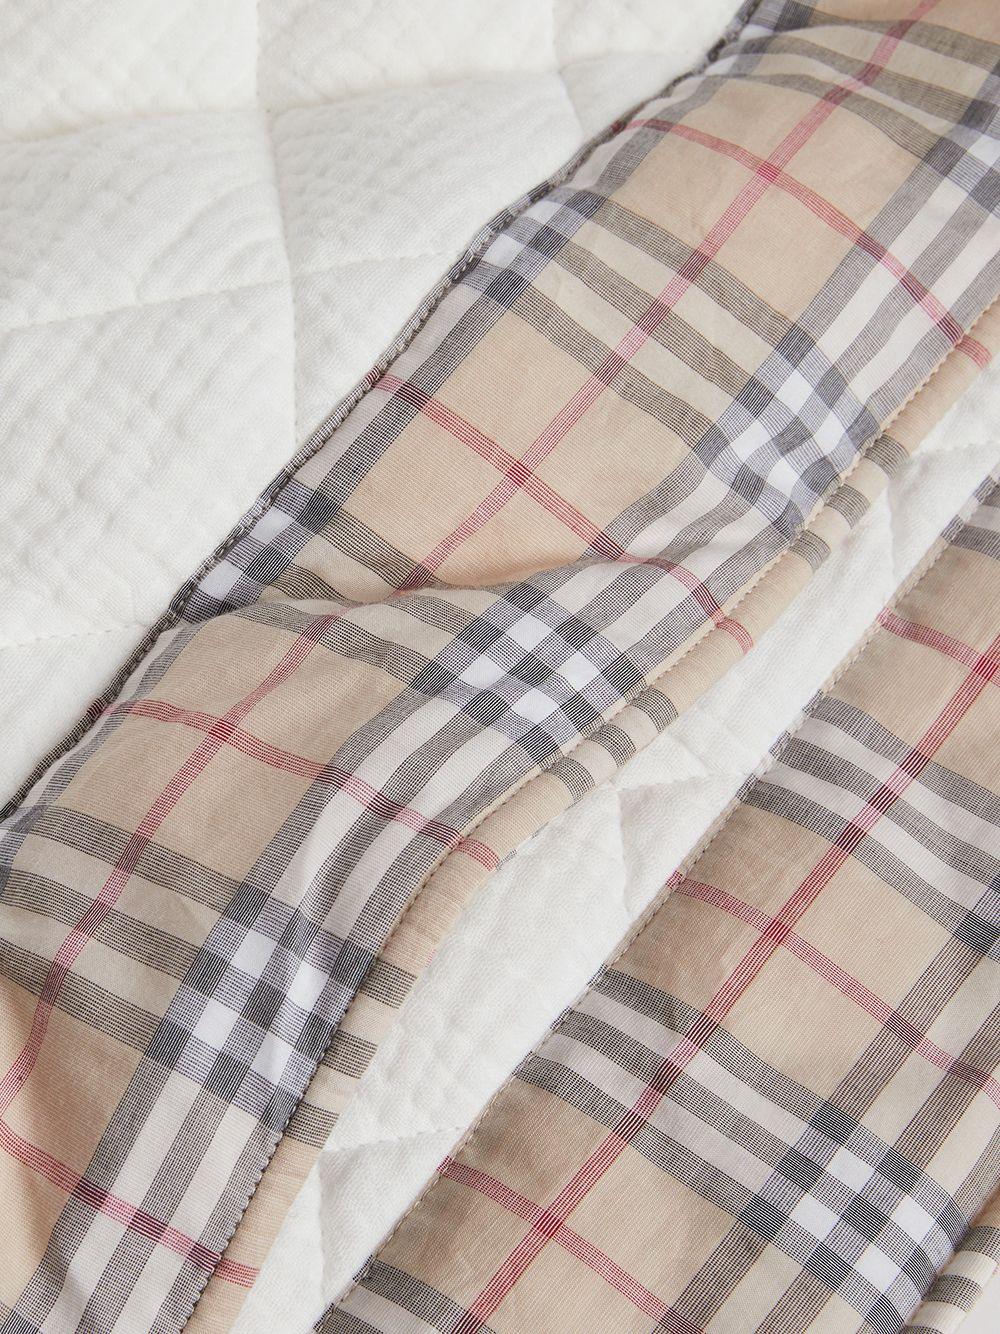 Burberry Kids | Burberry Kids стеганое одеяло в клетку Vintage check | Clouty